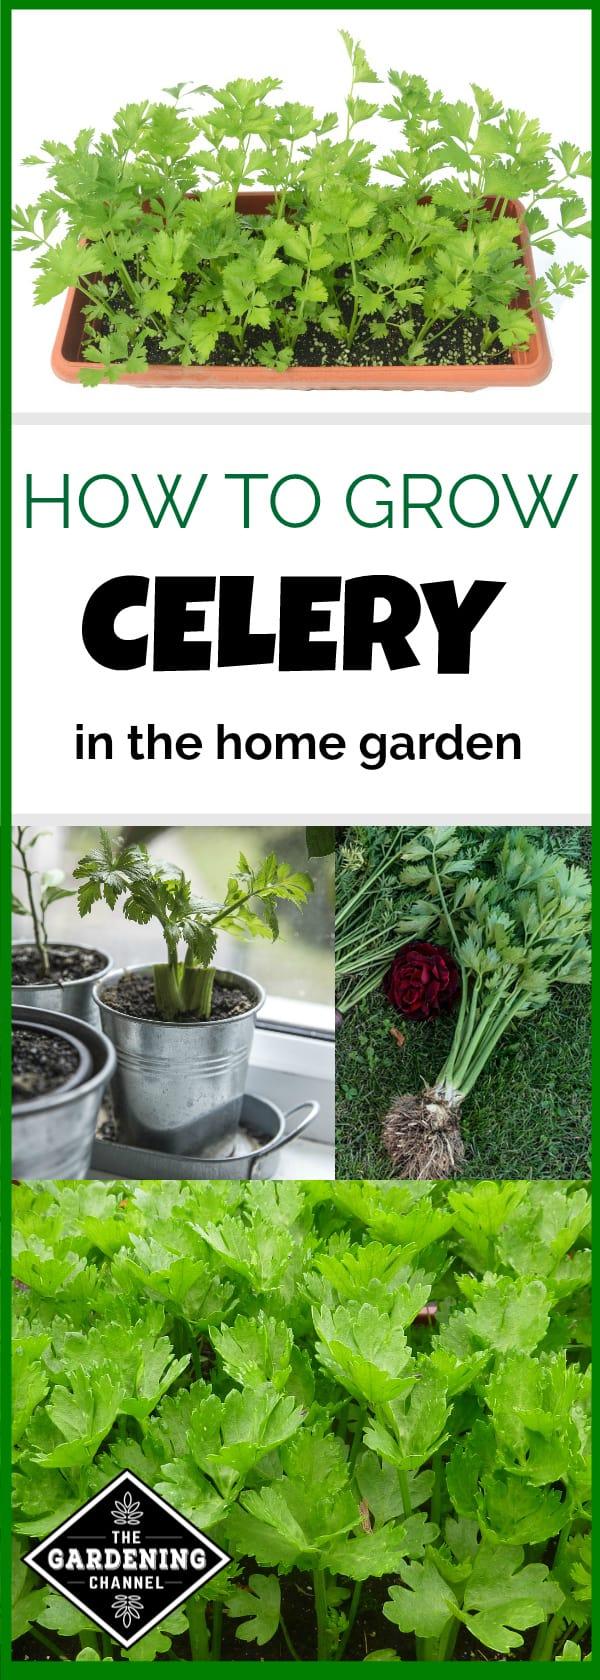 Growing Celery In Home Garden Gardening Channel